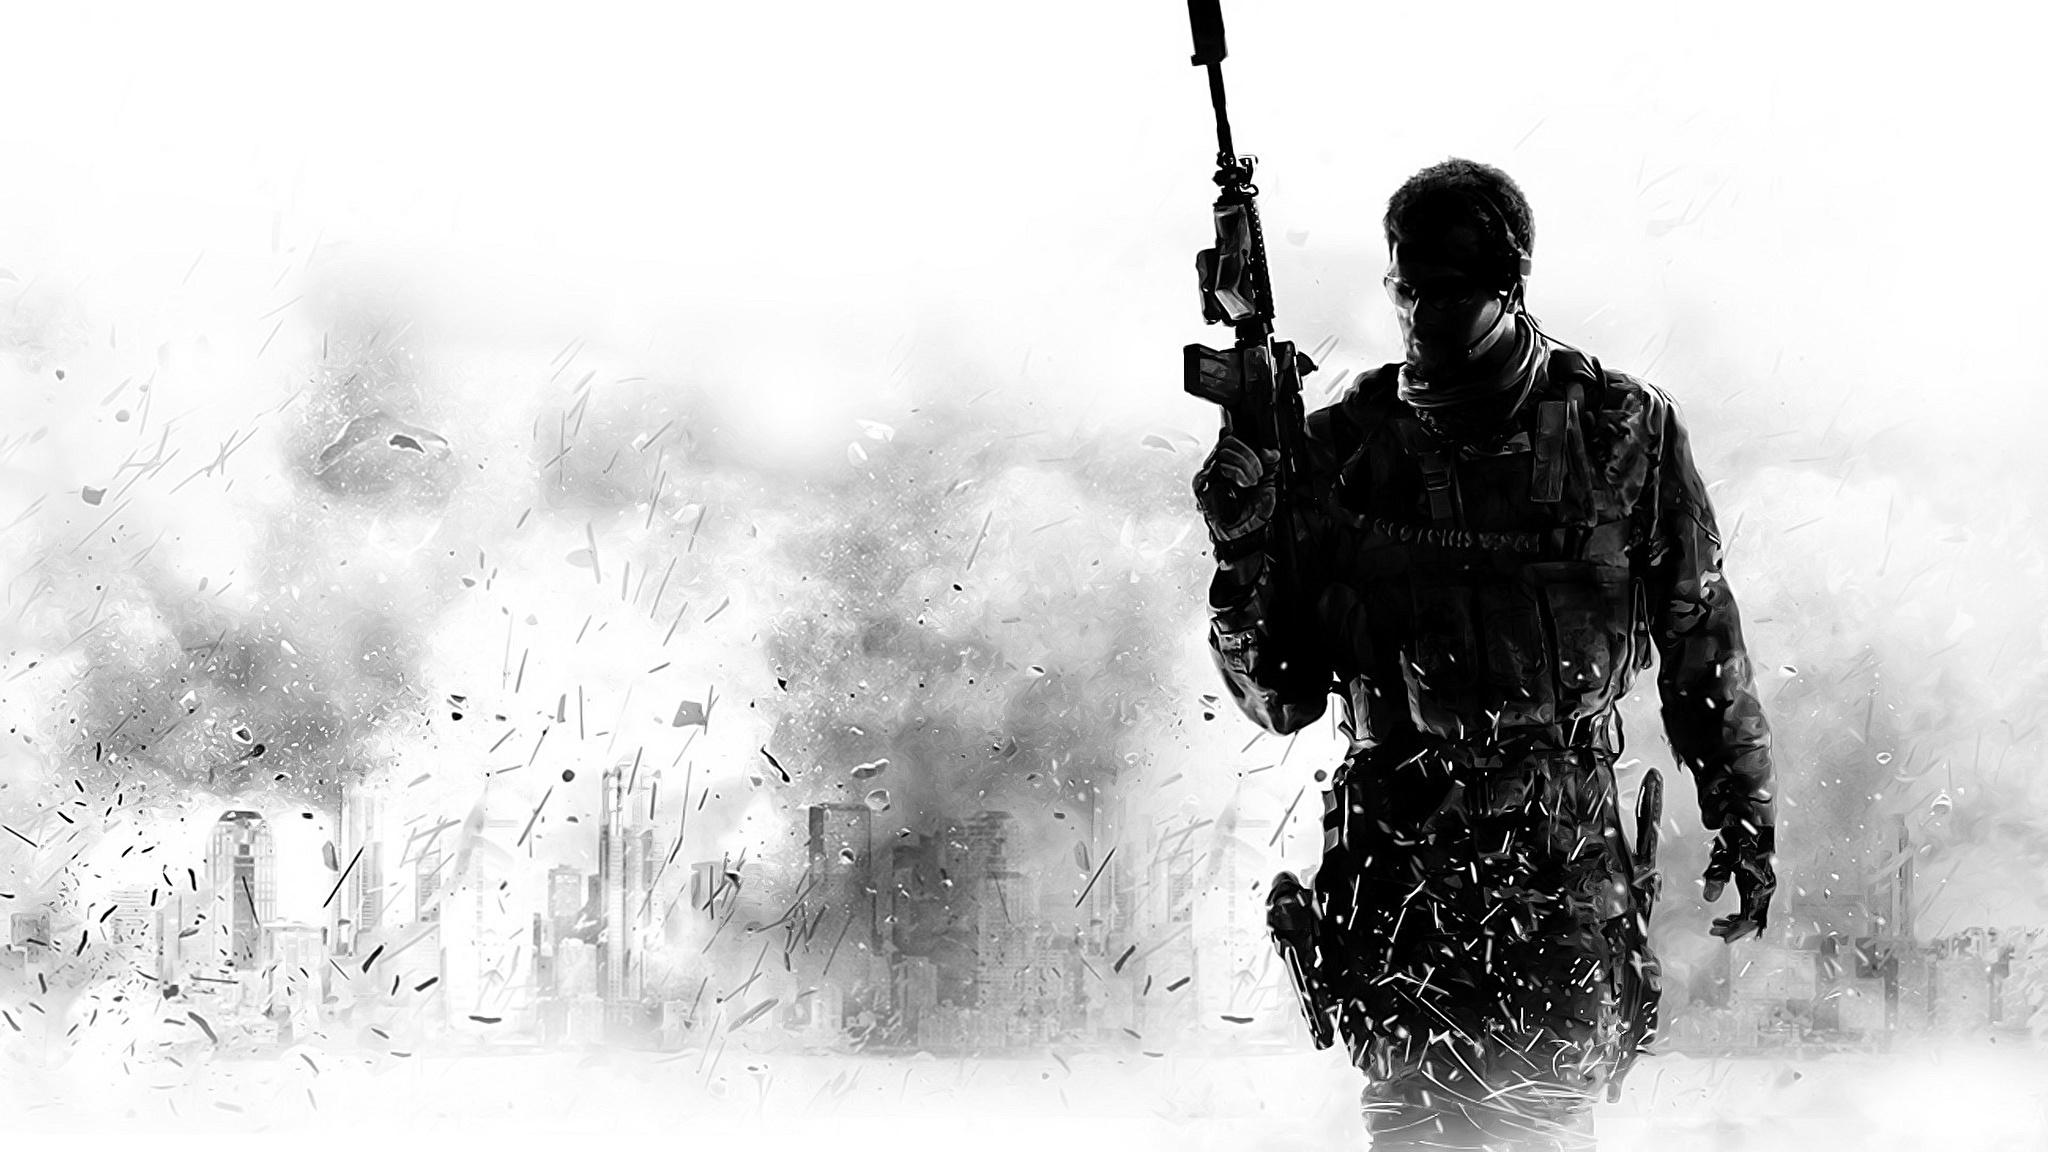 Call of Duty Modern Warfare  № 3671554 без смс